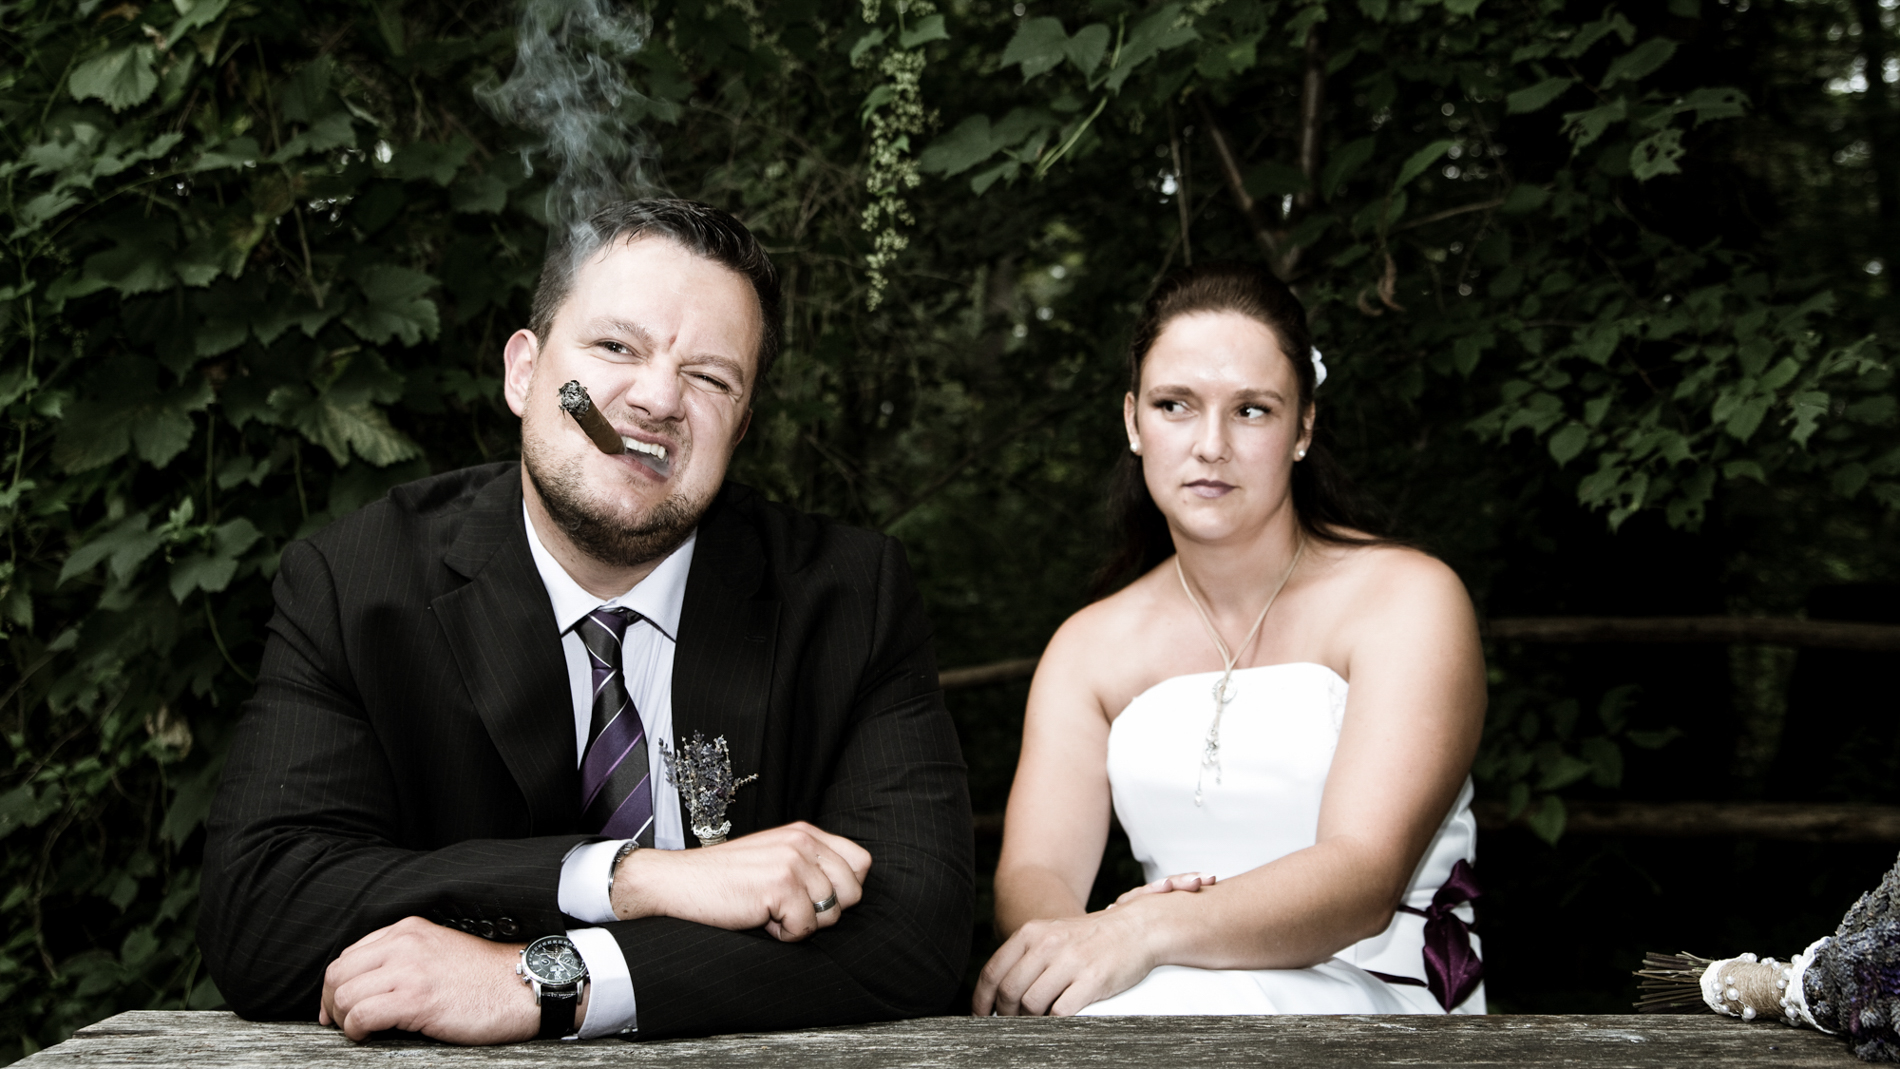 the_wedding_couple_says_the_world_best_wedding_photographer